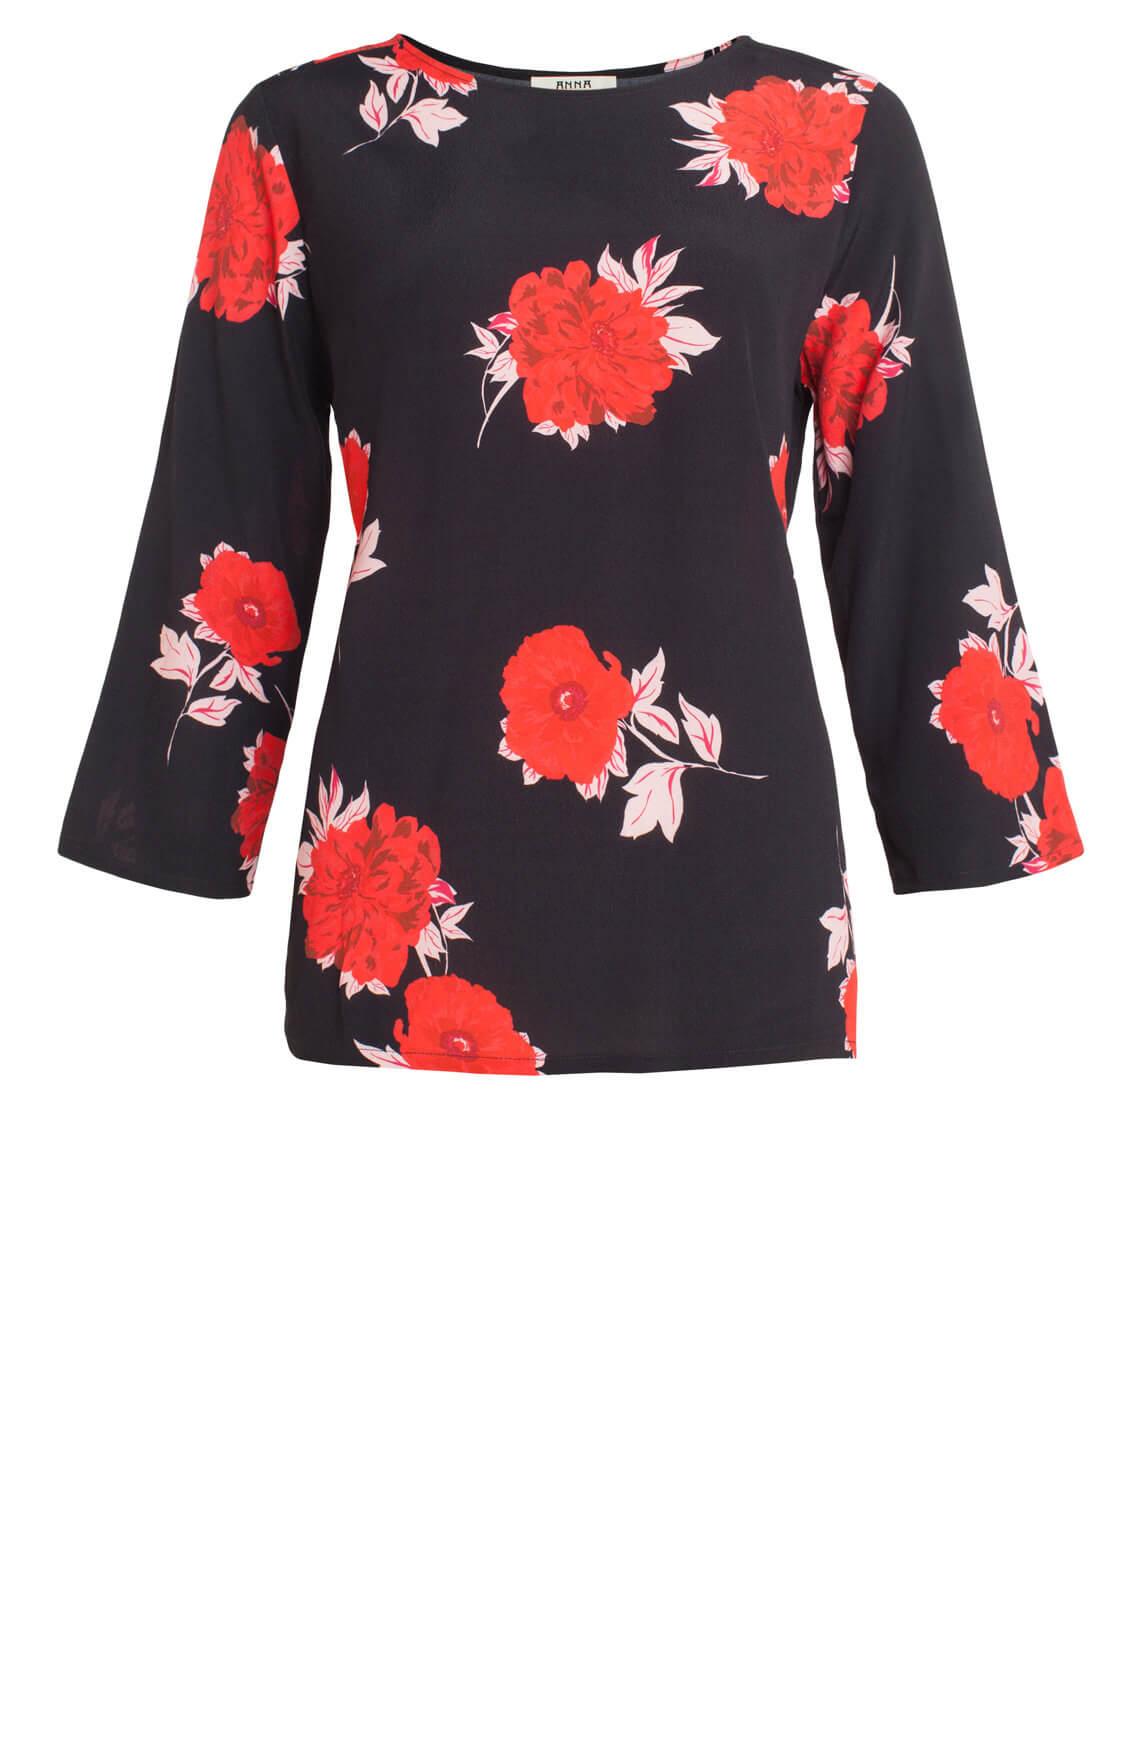 Anna Dames Blouse met bloemenprint Rood